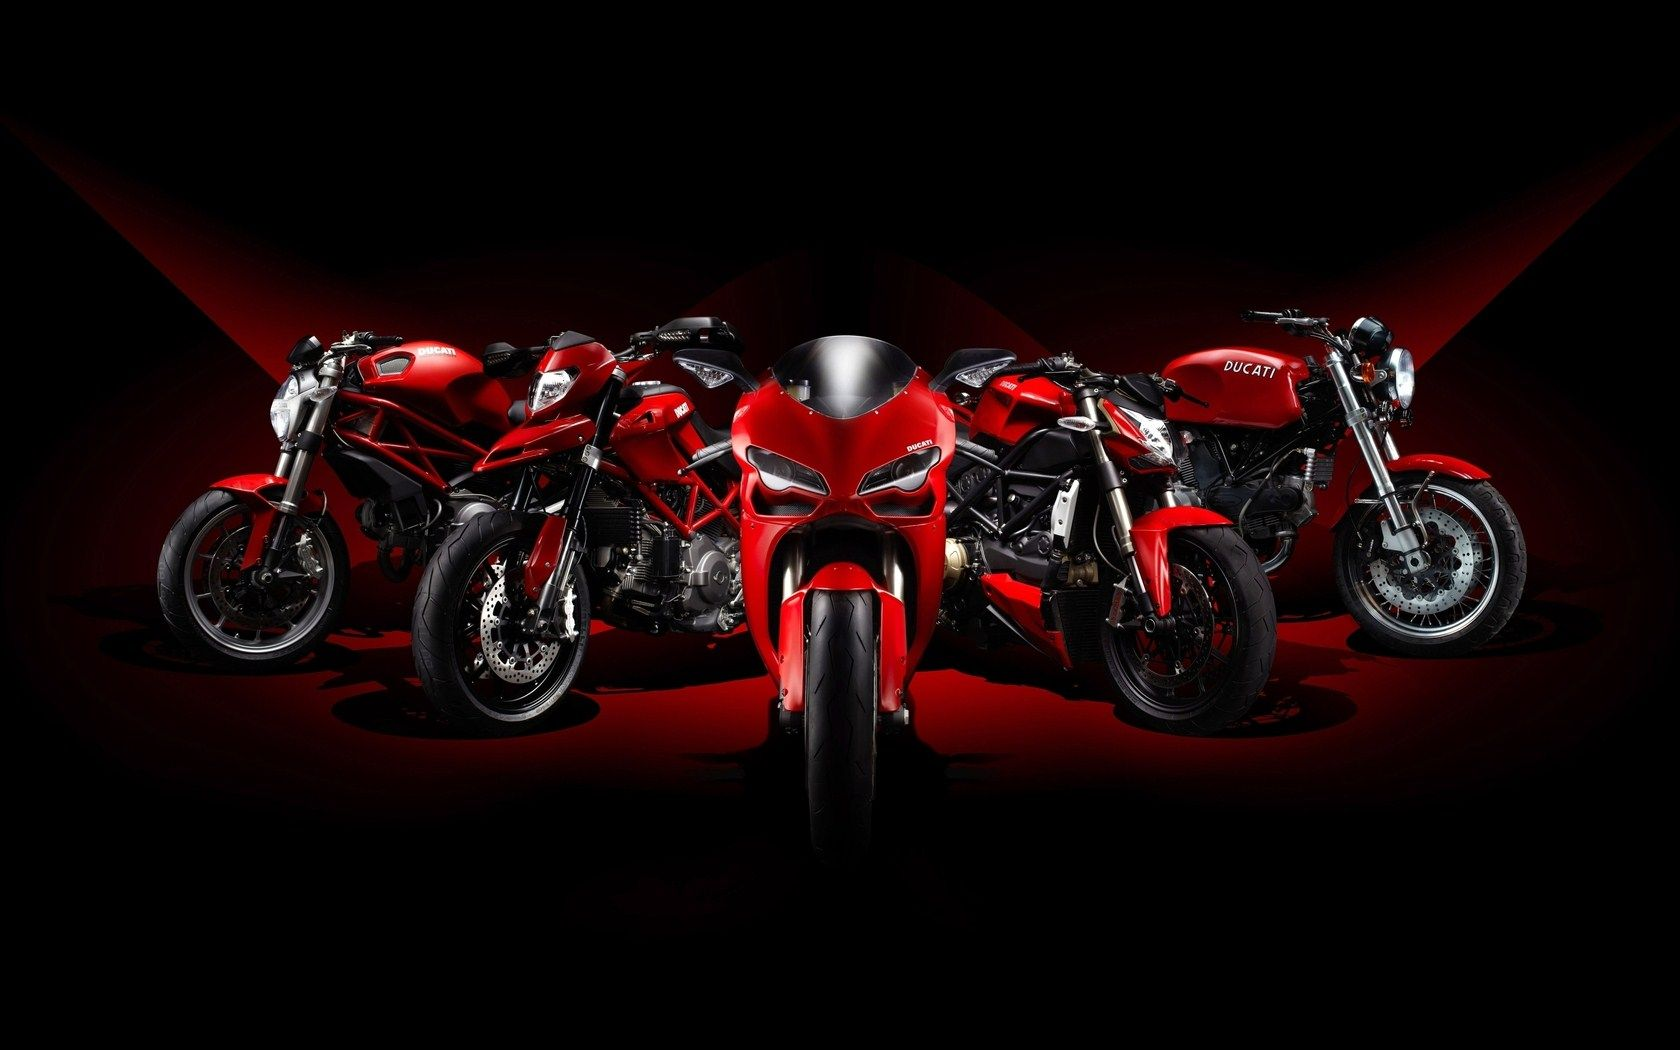 medium resolution of ducati bikes hd wallpaper